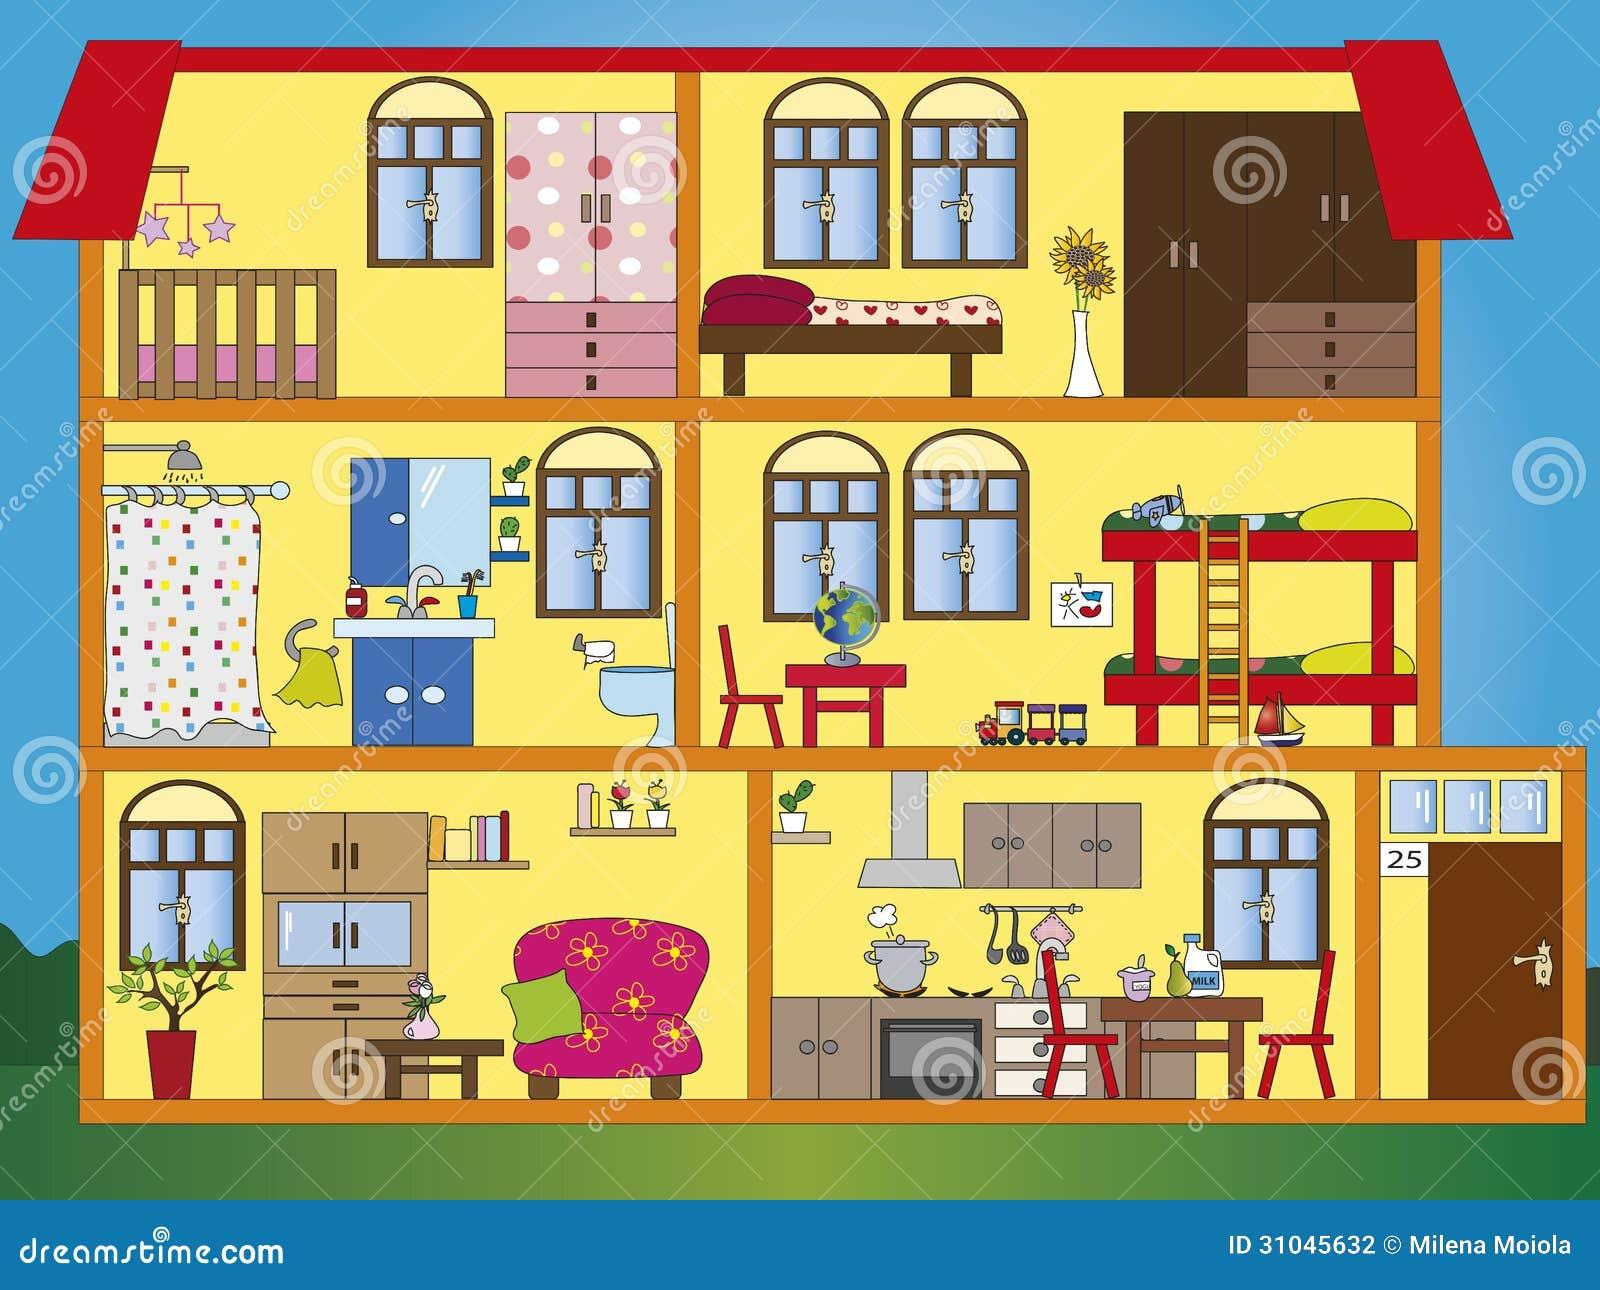 home interior clipart - photo #17